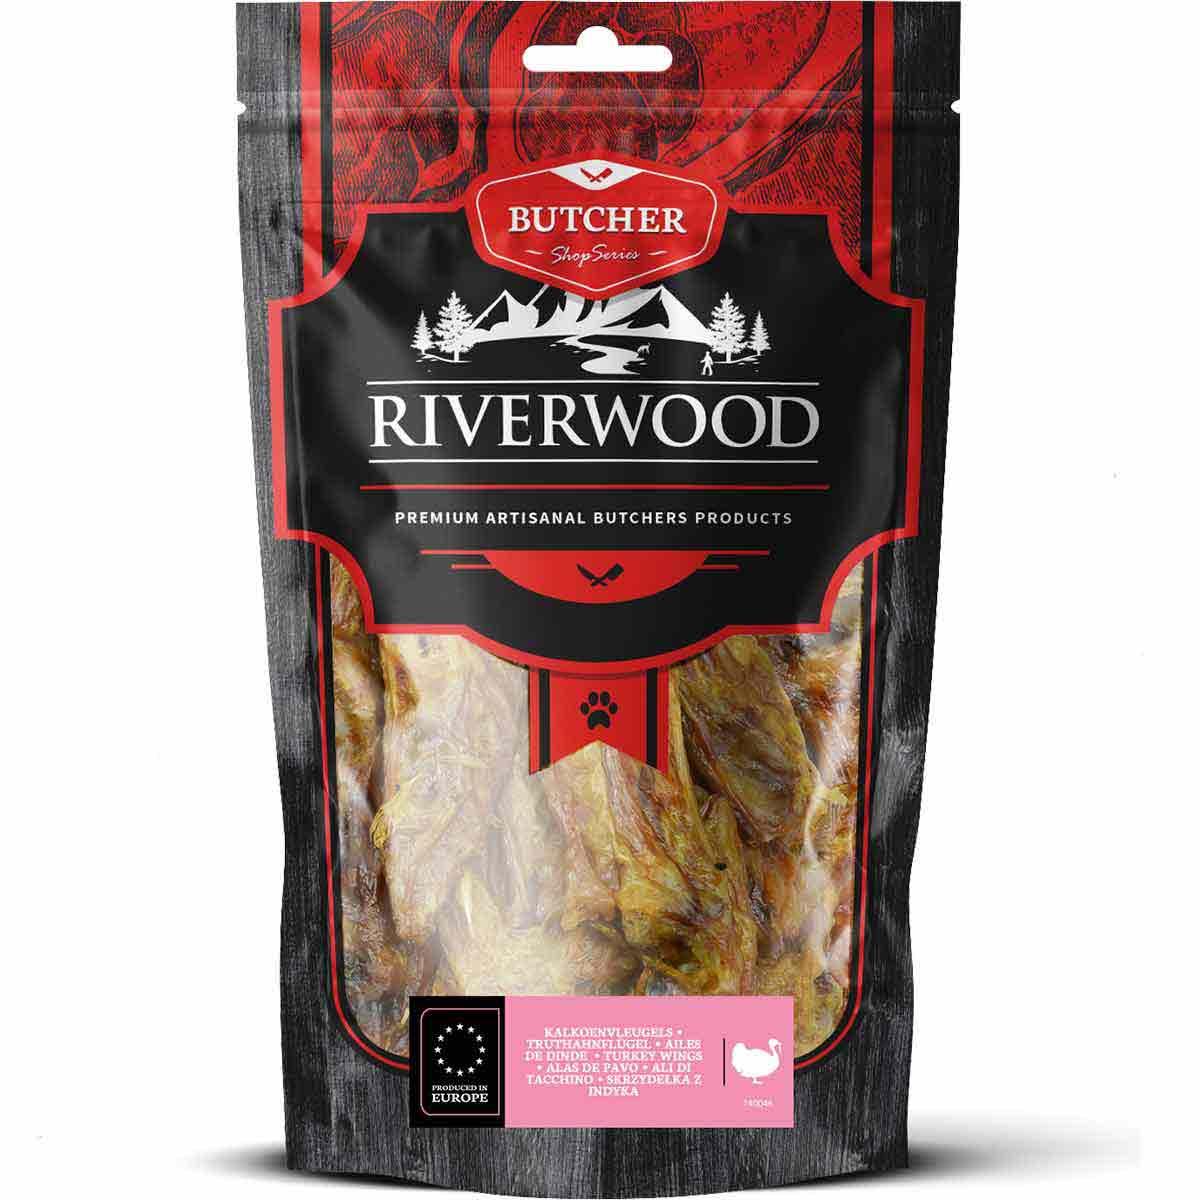 Riverwood Kalkoenvleugels